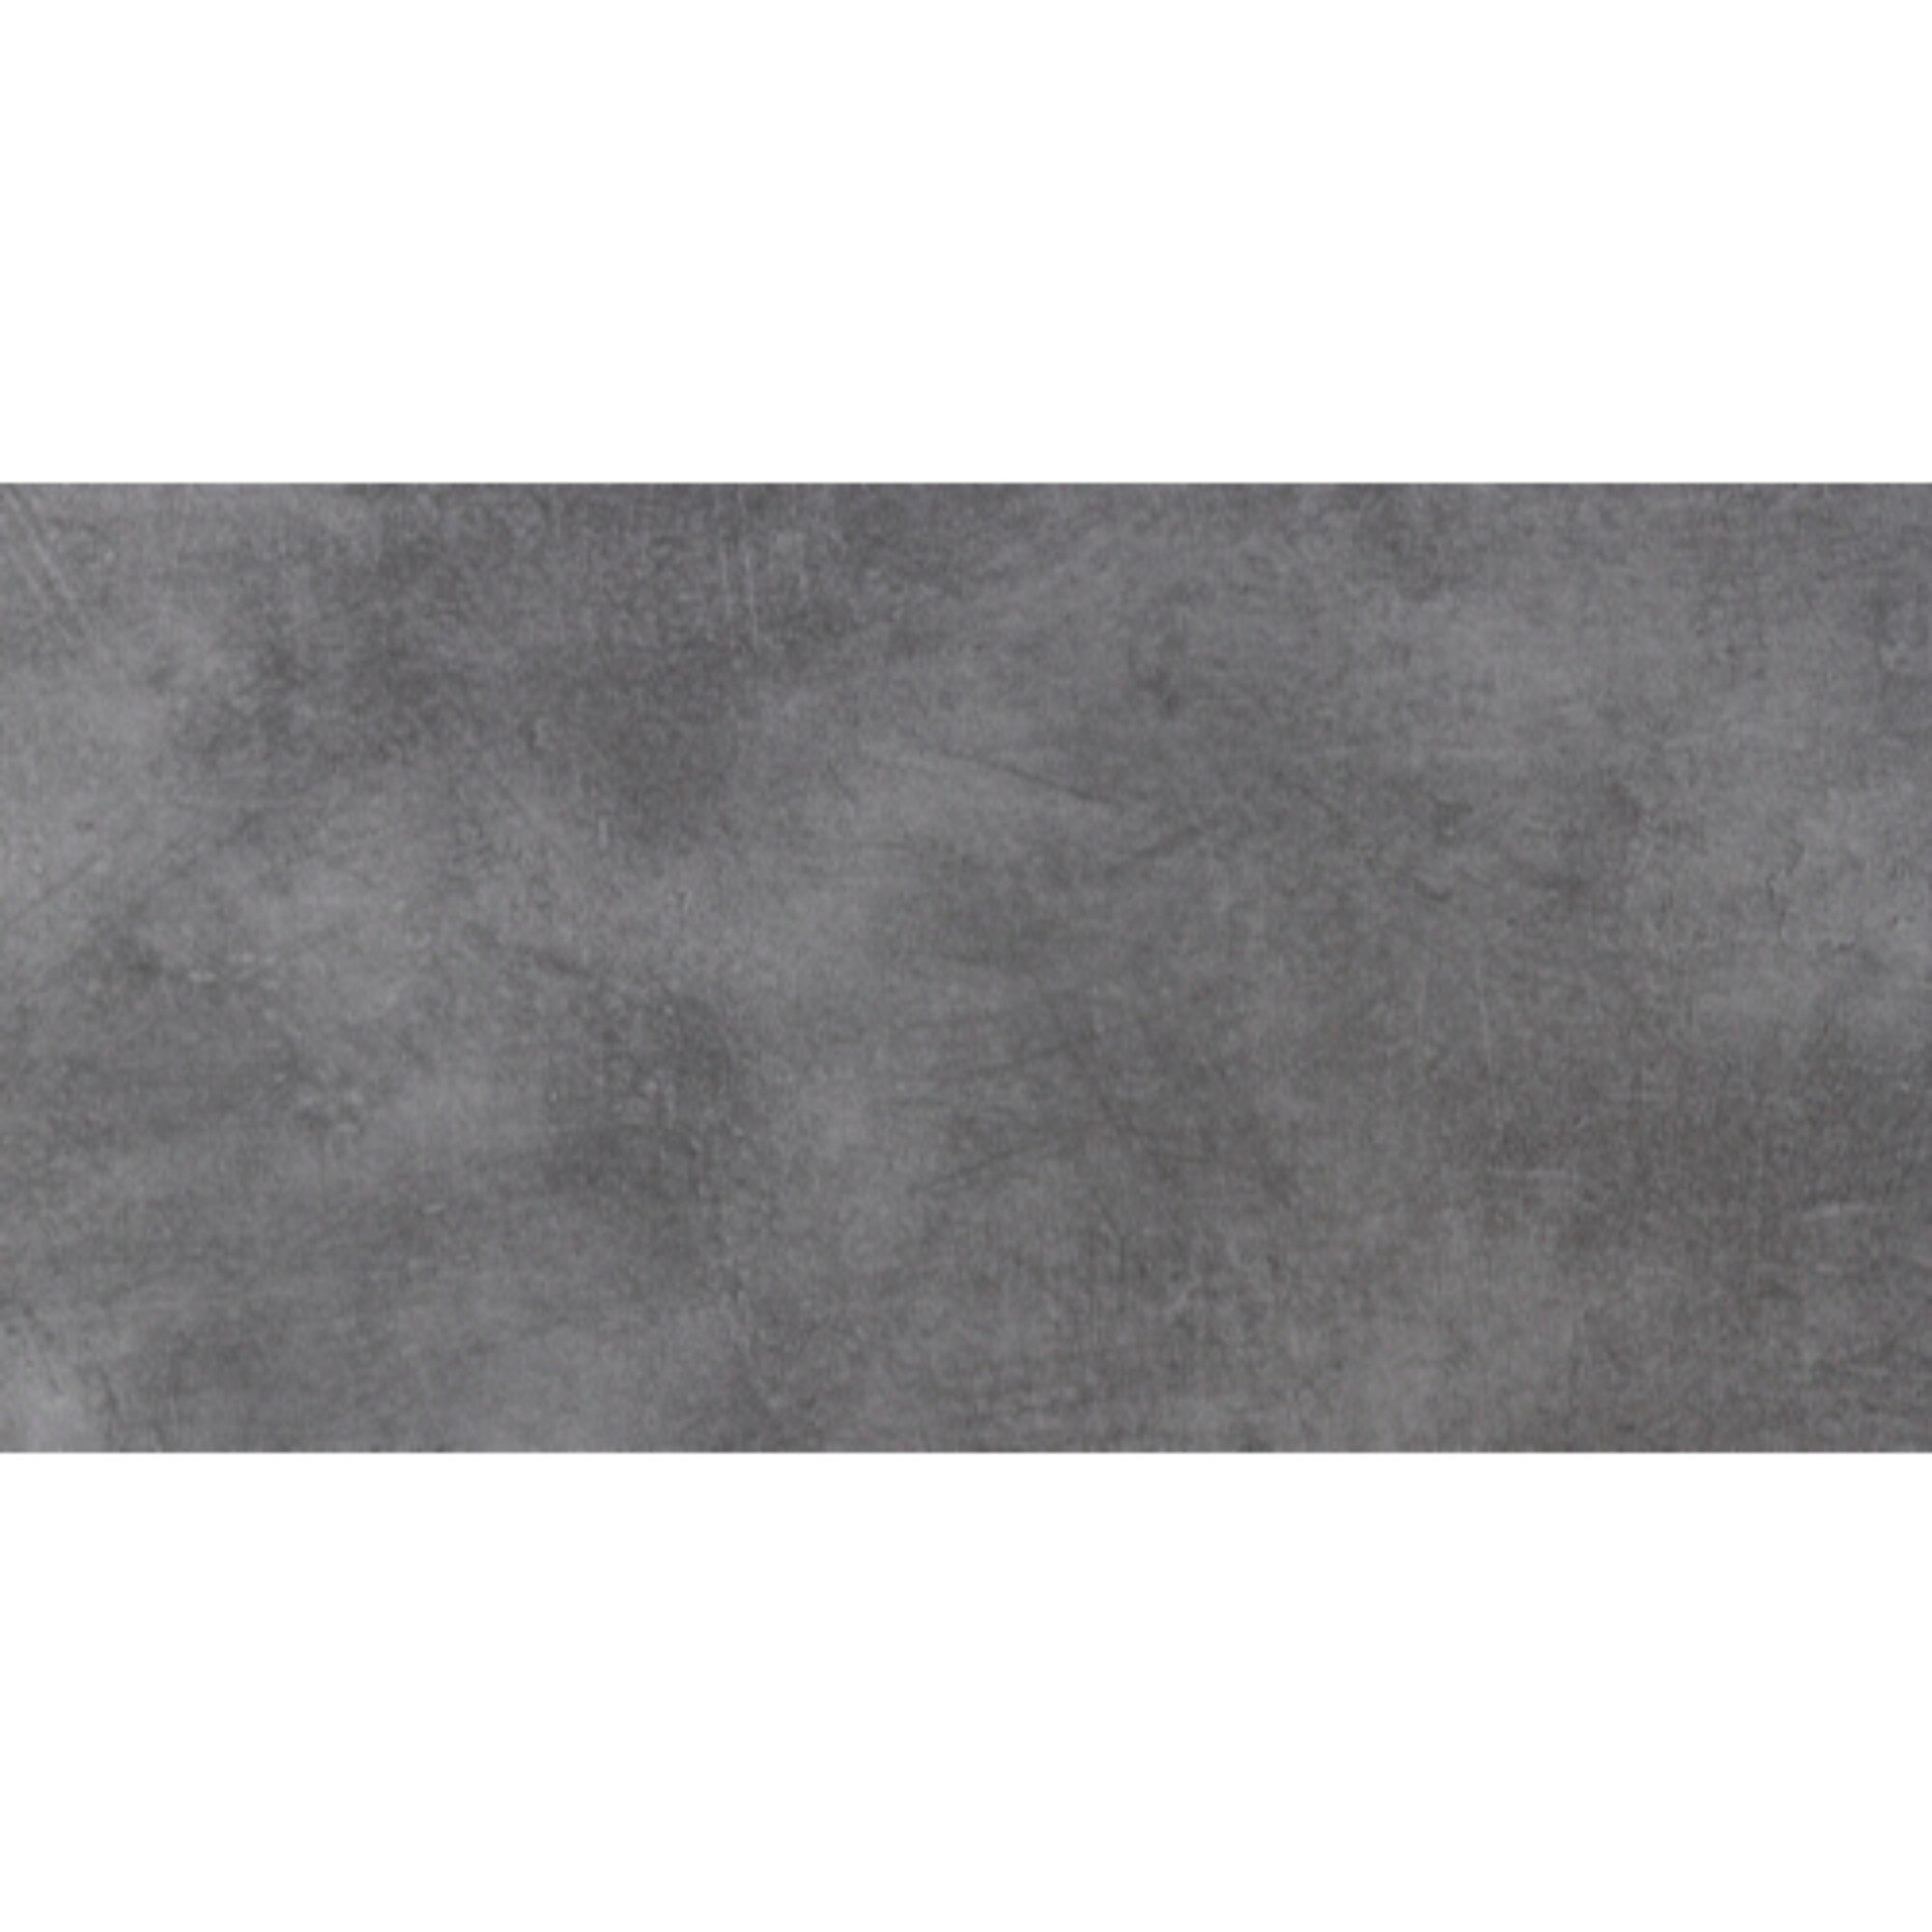 Mats Inc Easy Cover Pro Stone 12 X 24 Cement Field Tile Wayfair